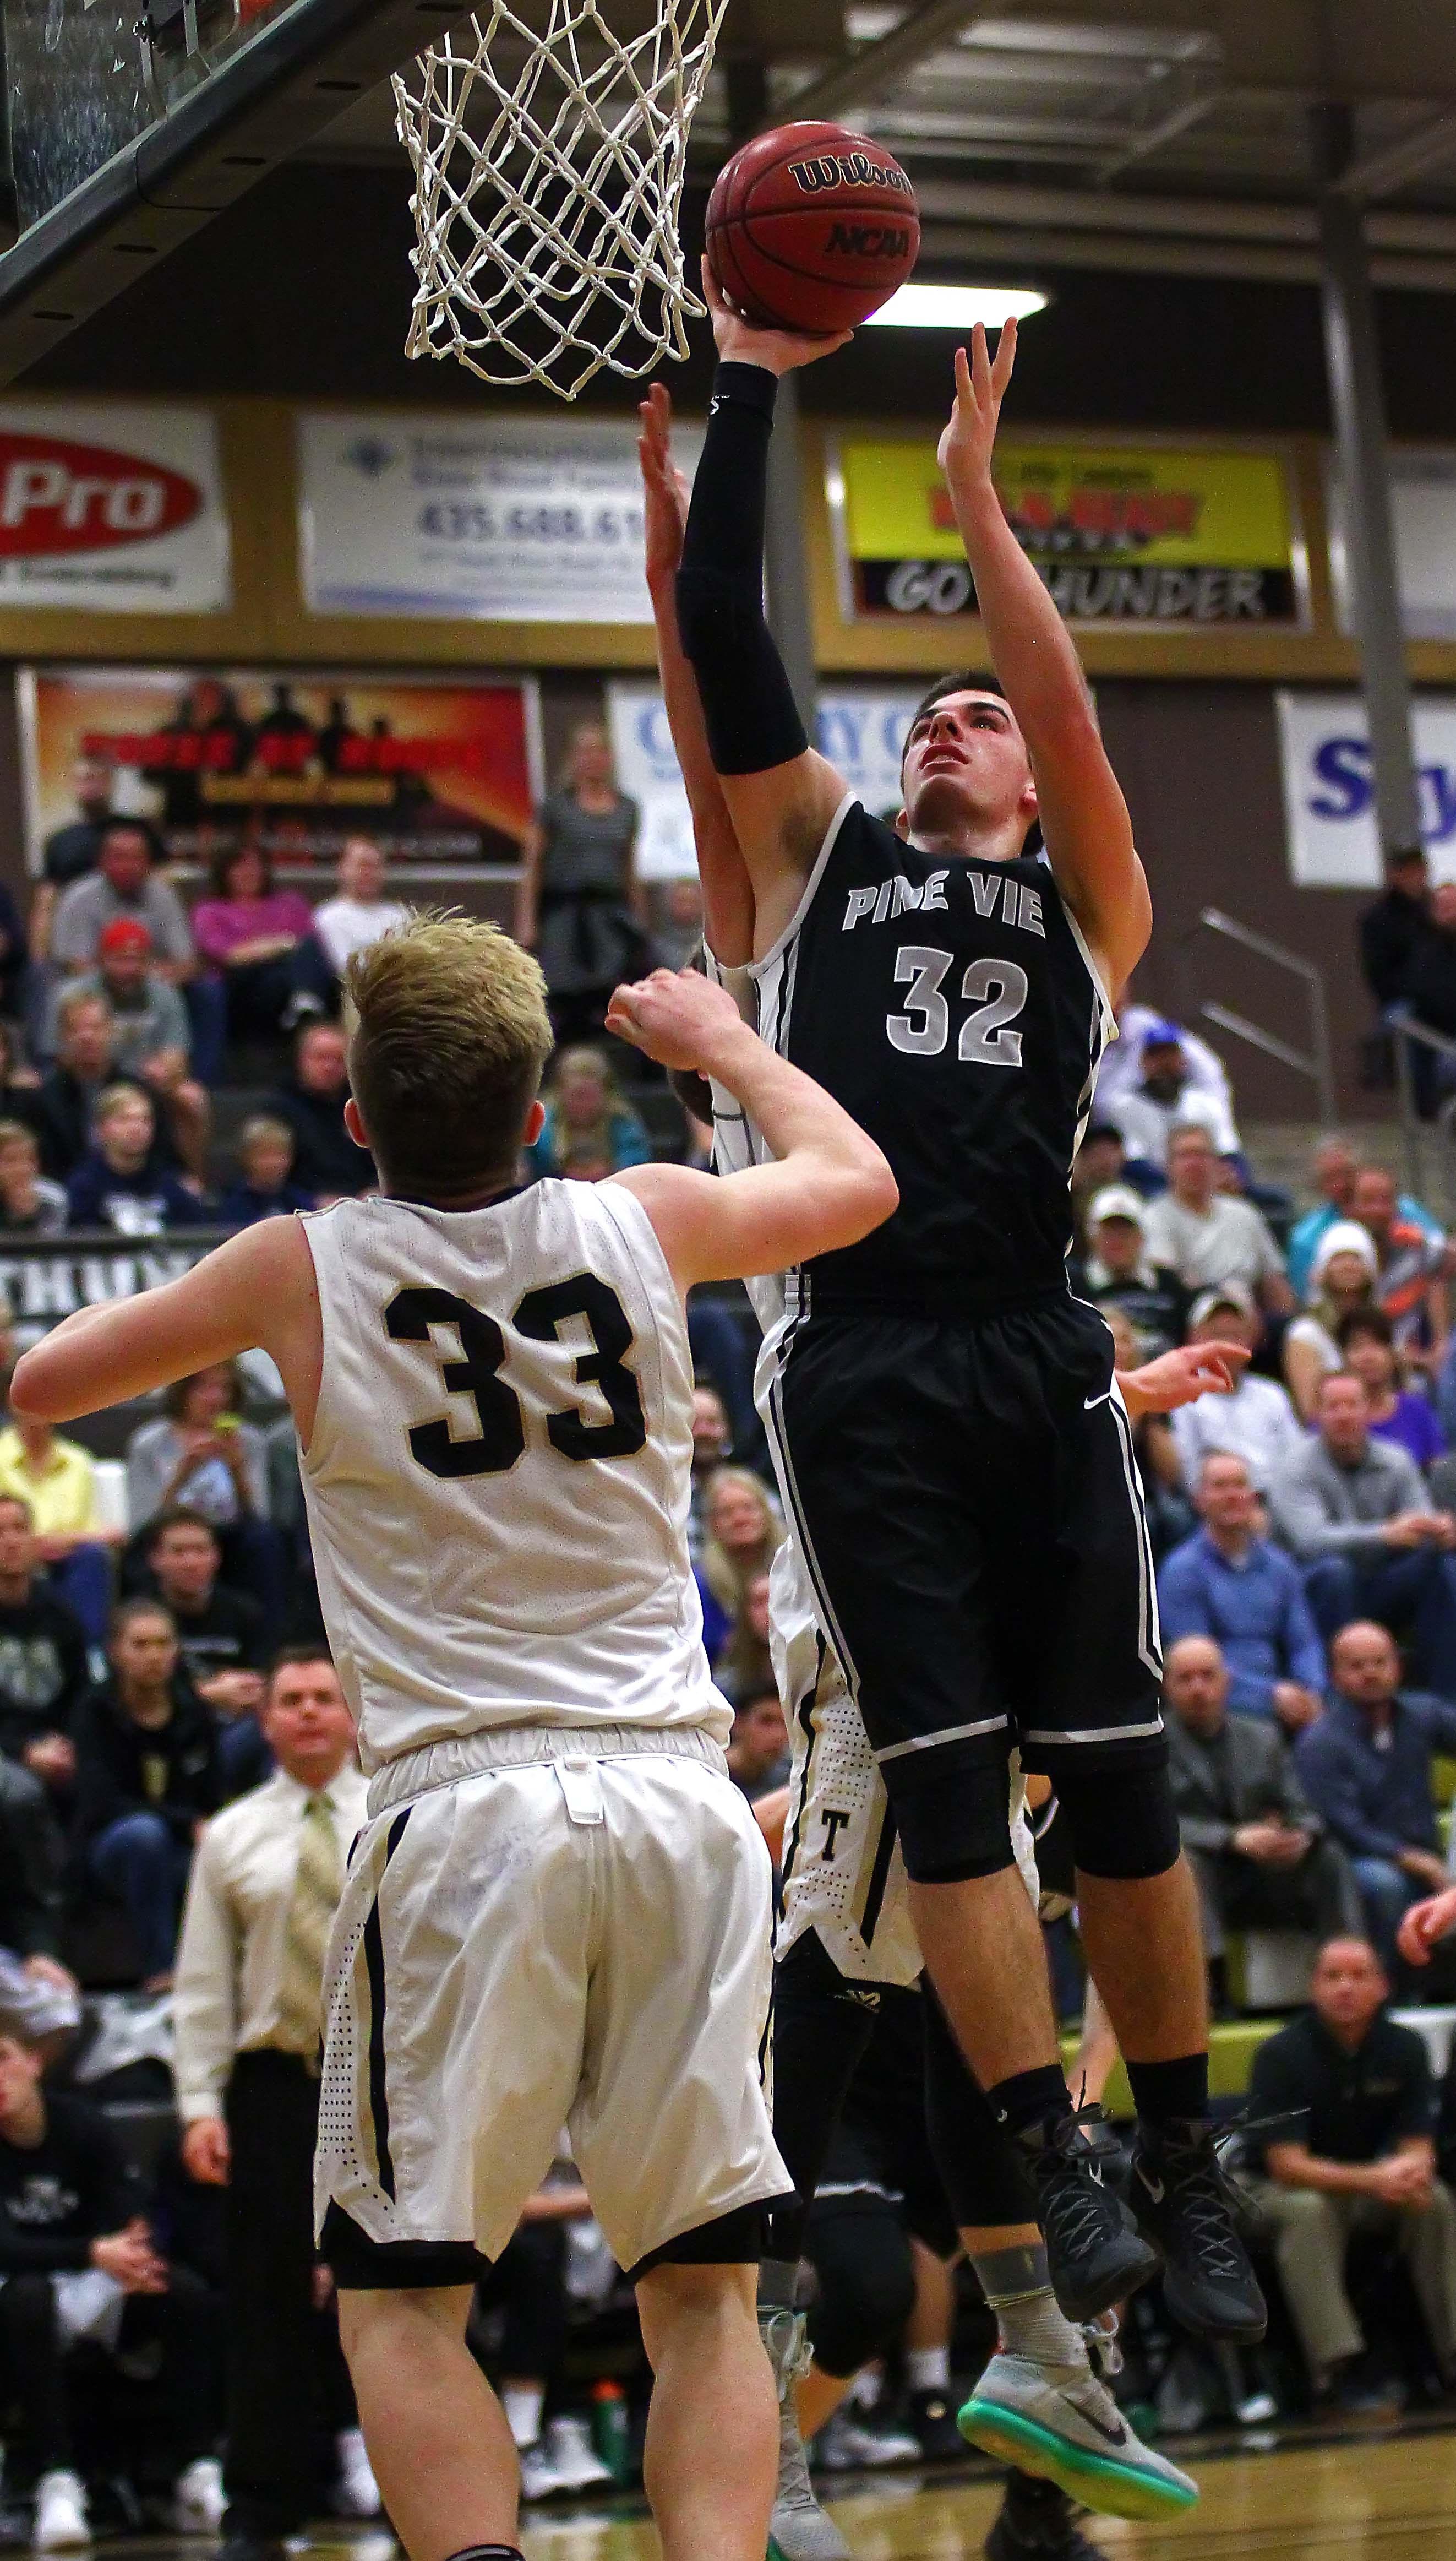 Pine View's Steve Bangerter (32), Desert Hills vs. Pine View, Boys Basketball, St. George, Utah, Jan. 22, 2016, | Photo by Robert Hoppie, ASPpix.com, St. George News